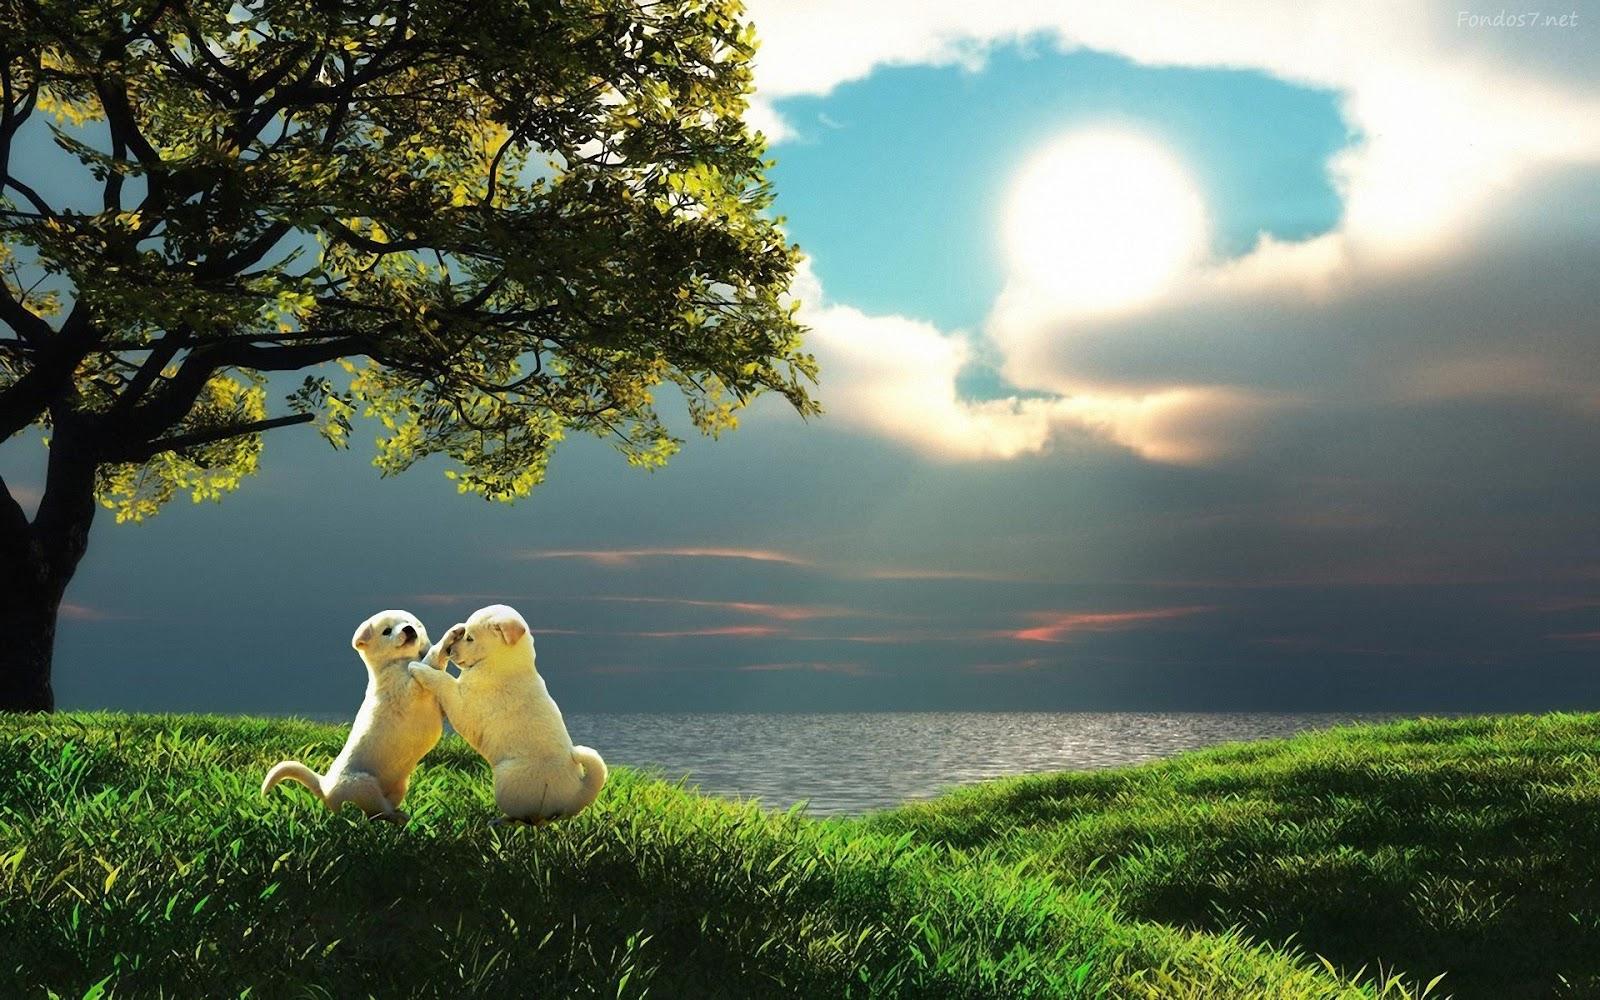 http://1.bp.blogspot.com/-jq-oqWgB7zQ/UNH8VG8197I/AAAAAAAABng/WcmyhbhM-jc/s1600/cachorros-de-perro-2.jpg